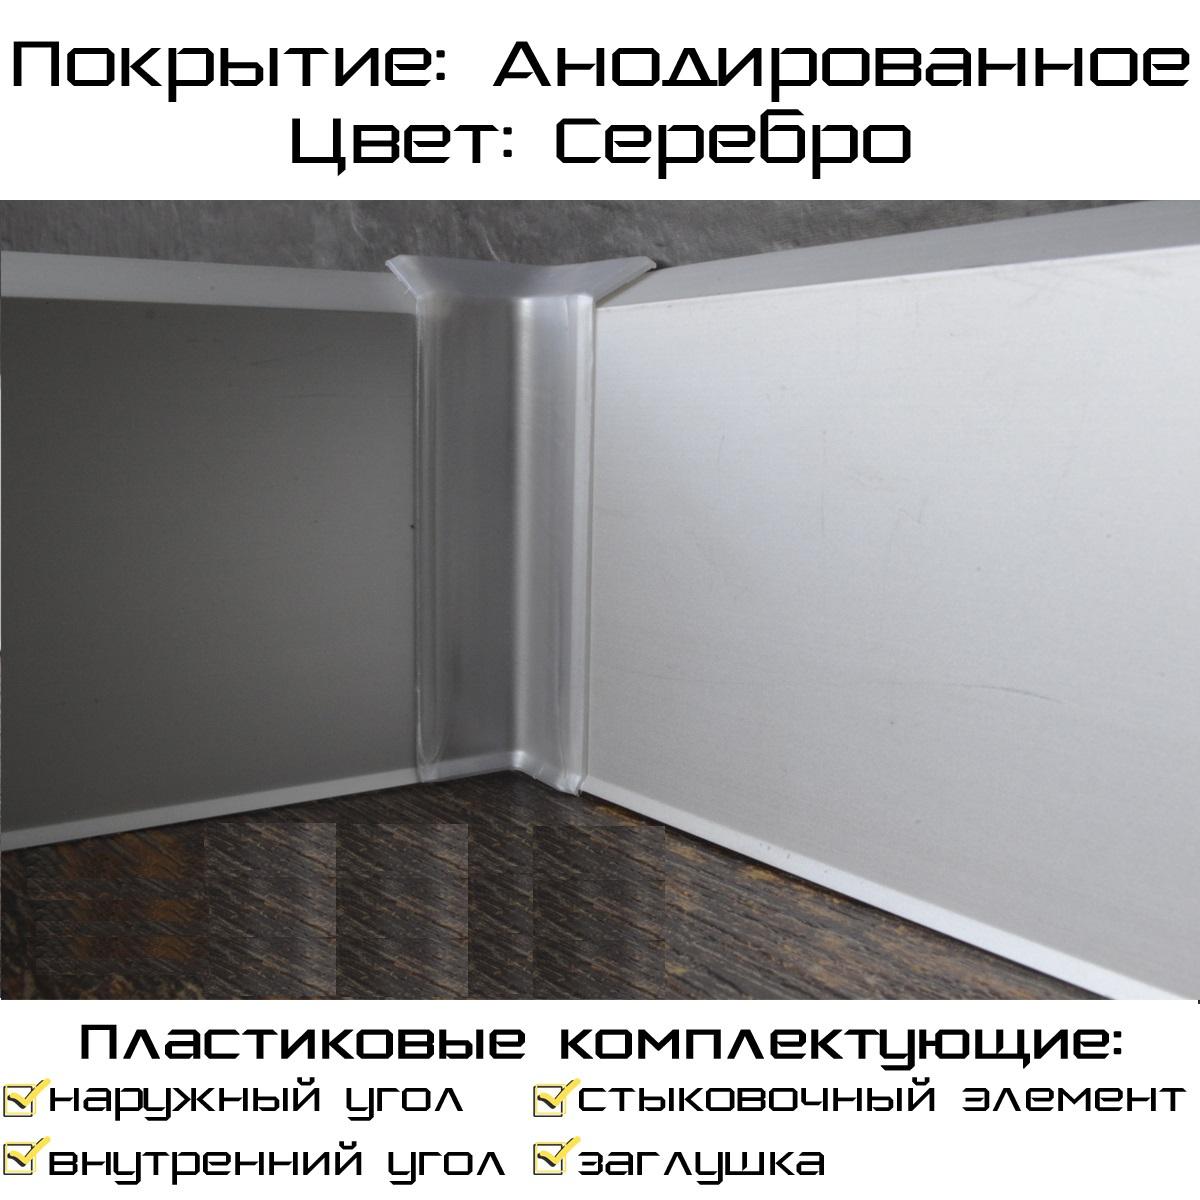 https://www.e-t1.ru/images/upload/DSC_6788.JPG